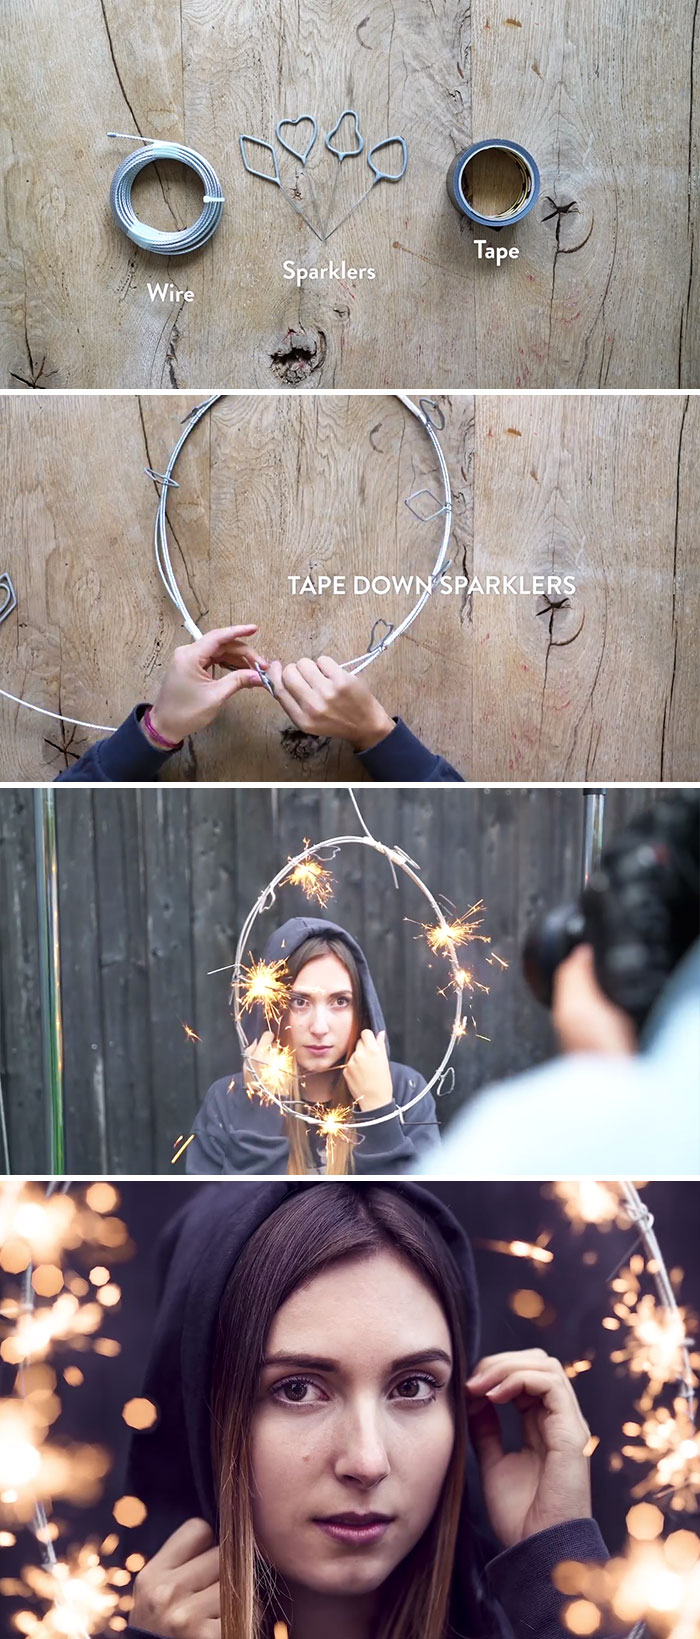 easy-camera-hacks-how-to-improve-photography-skills-20-596f5e83ac219__700